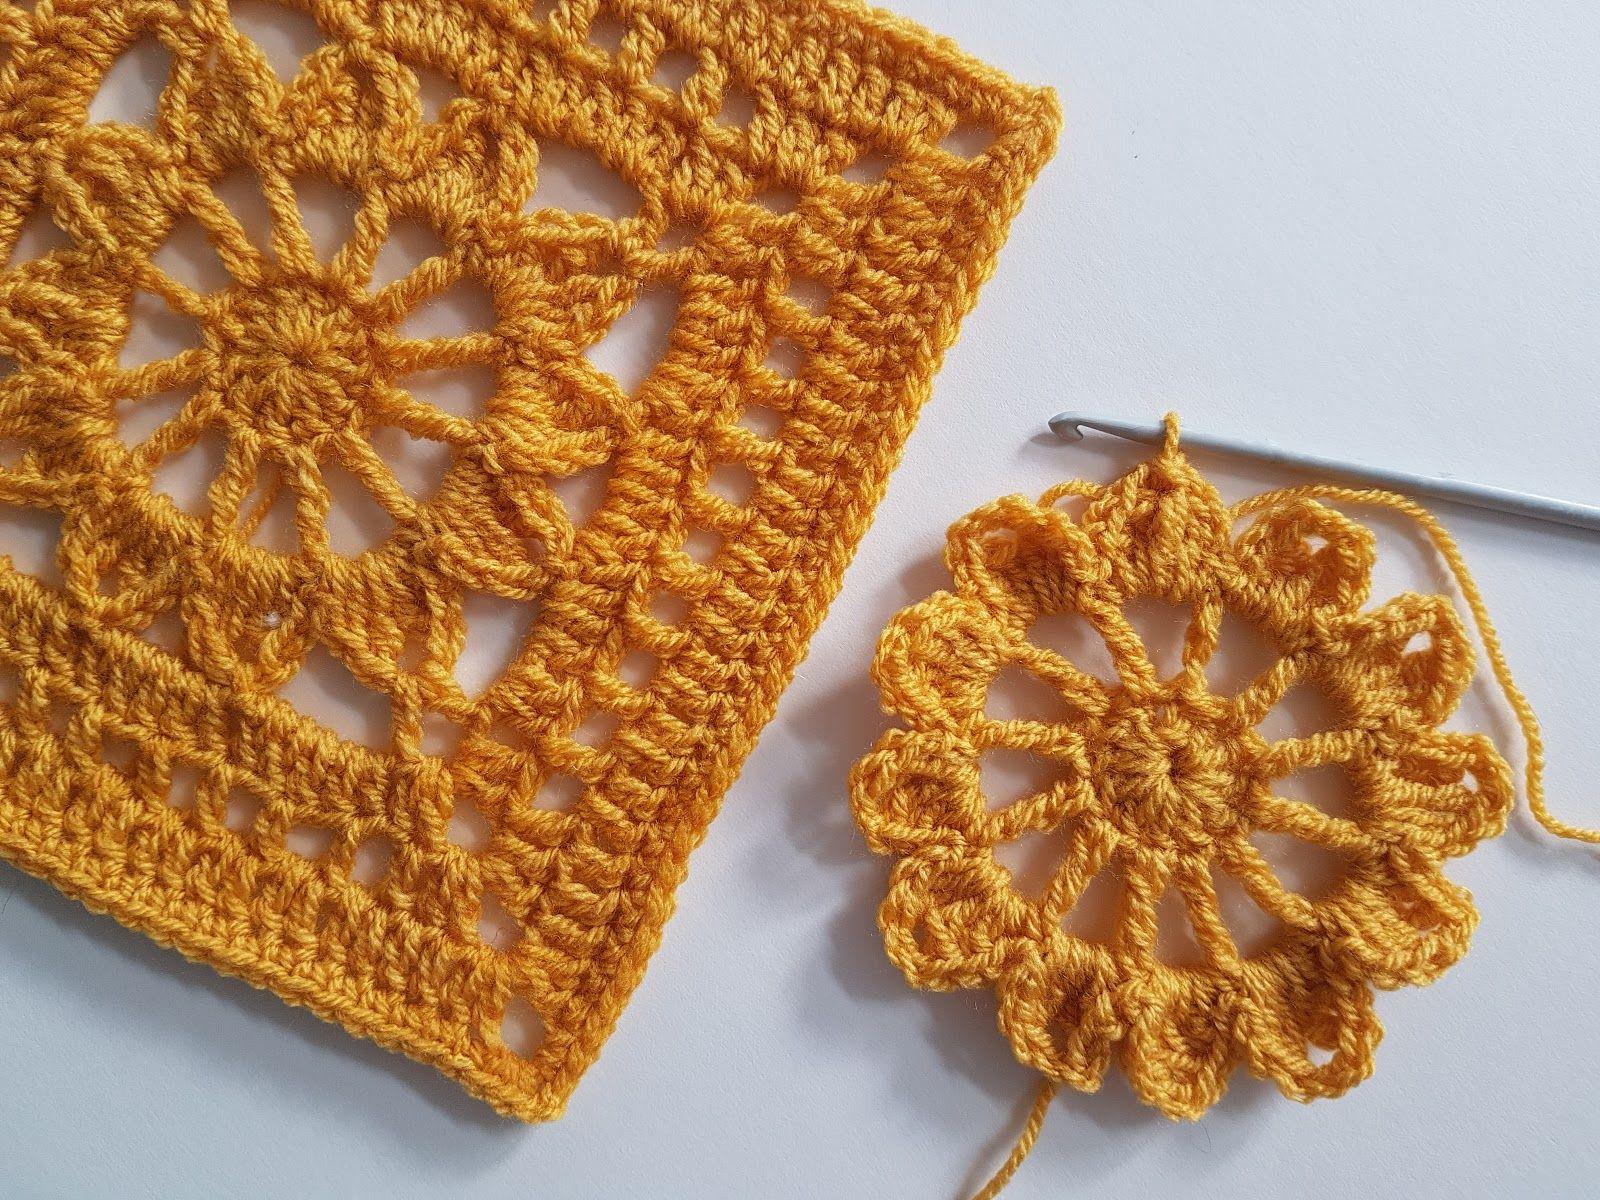 red sparrow crochet            : Emma's Throw- a free crochet pattern!